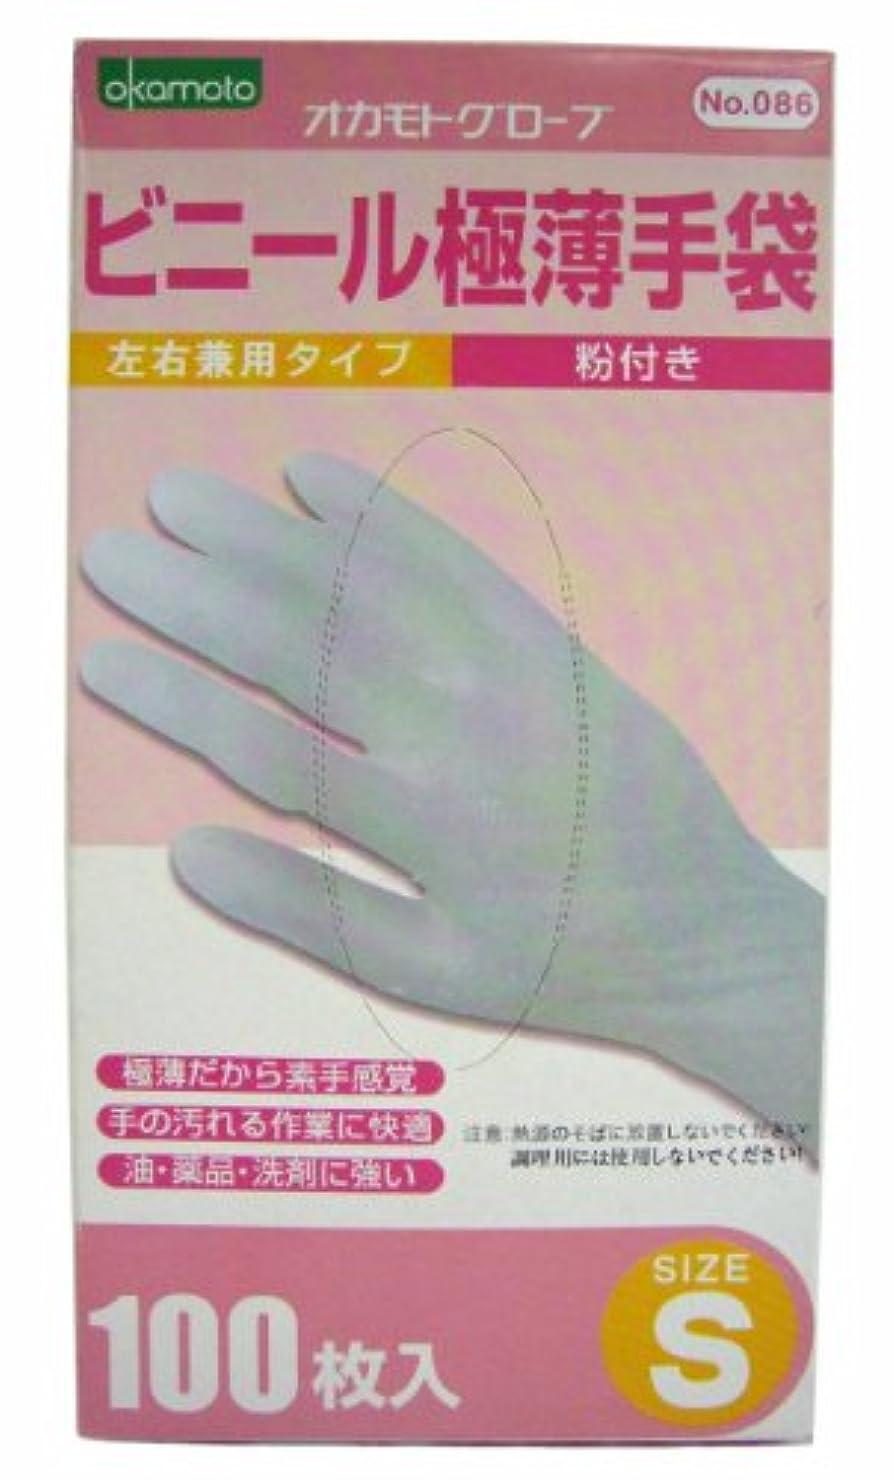 大人干渉接地ビニール極薄手袋 粉付き 100枚入 S